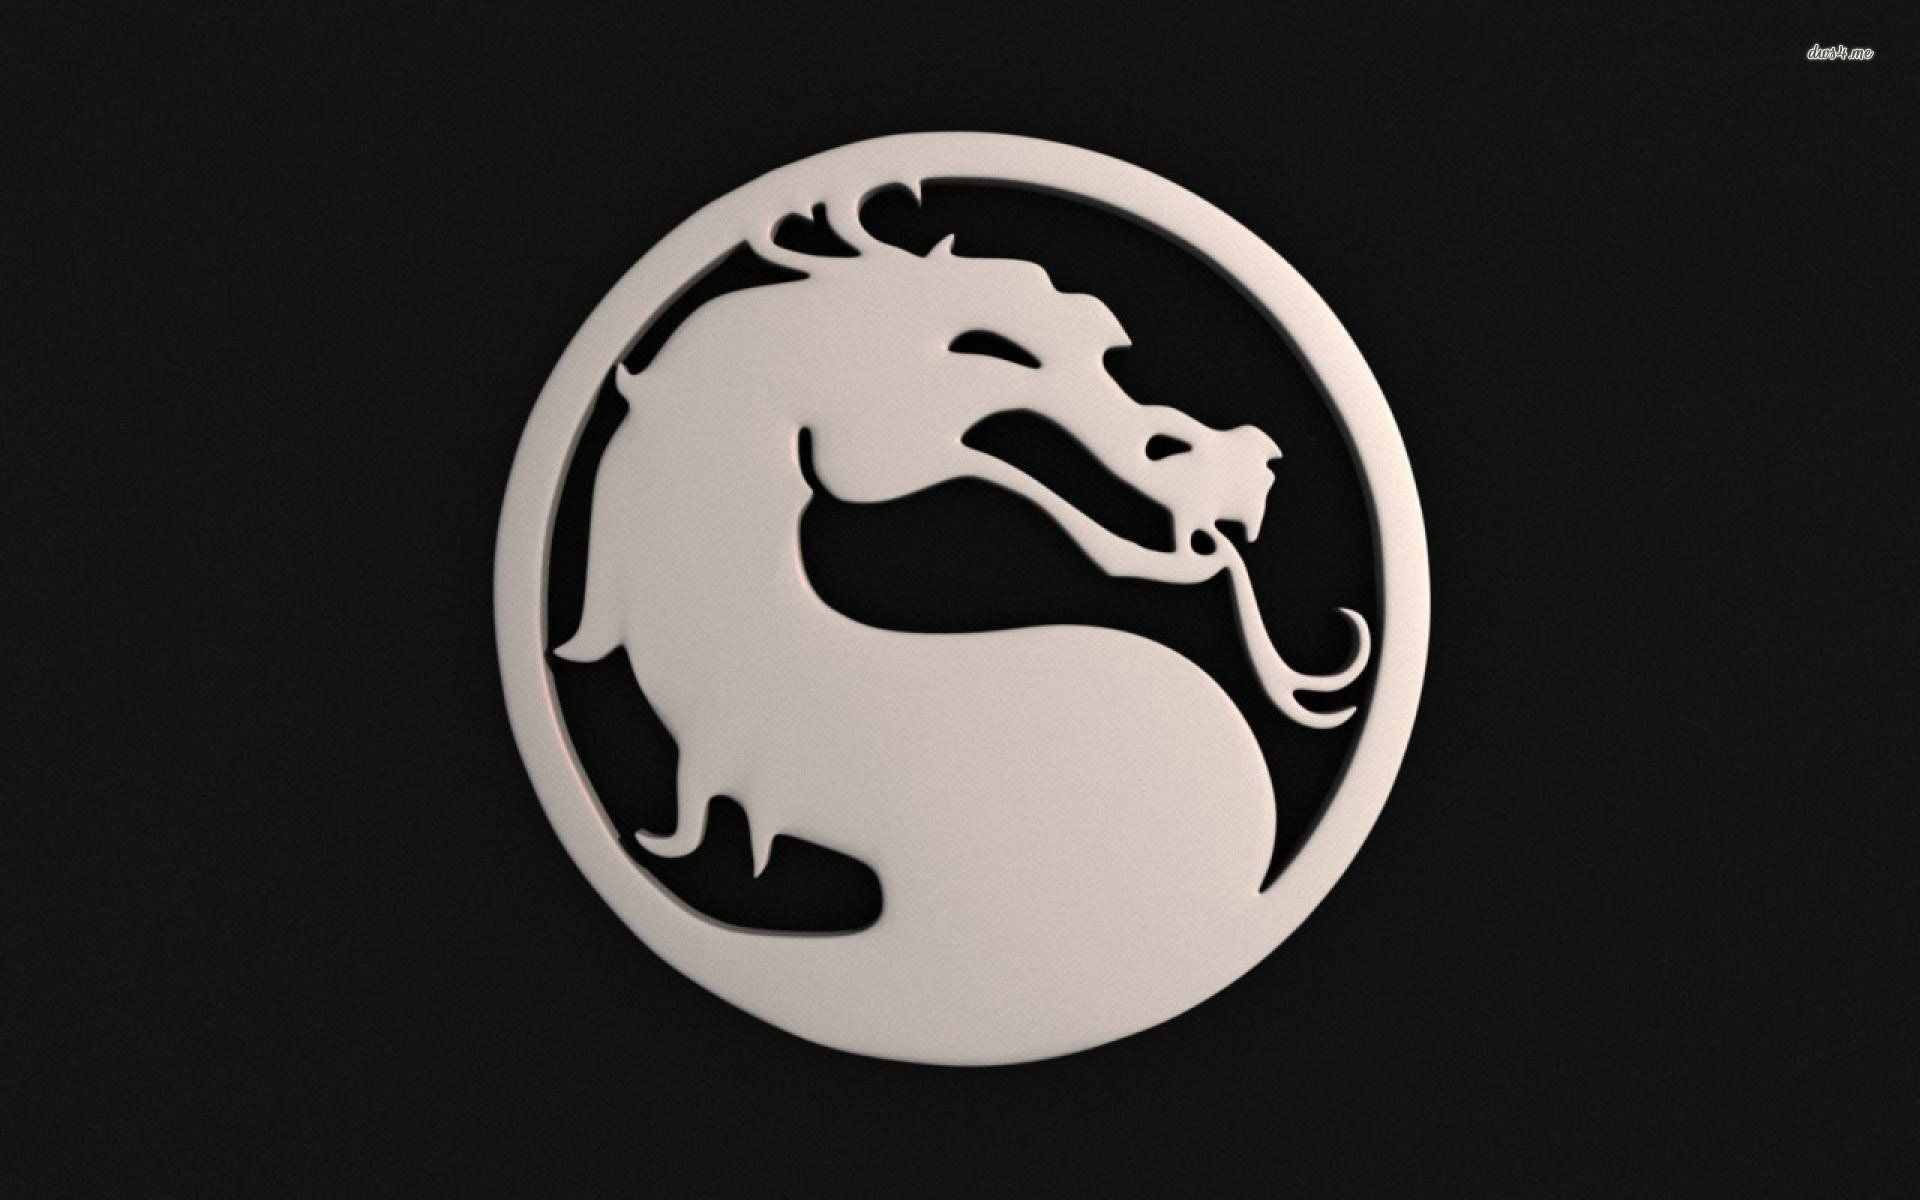 Mortal Kombat Logo Wallpapers - Top Free Mortal Kombat ...